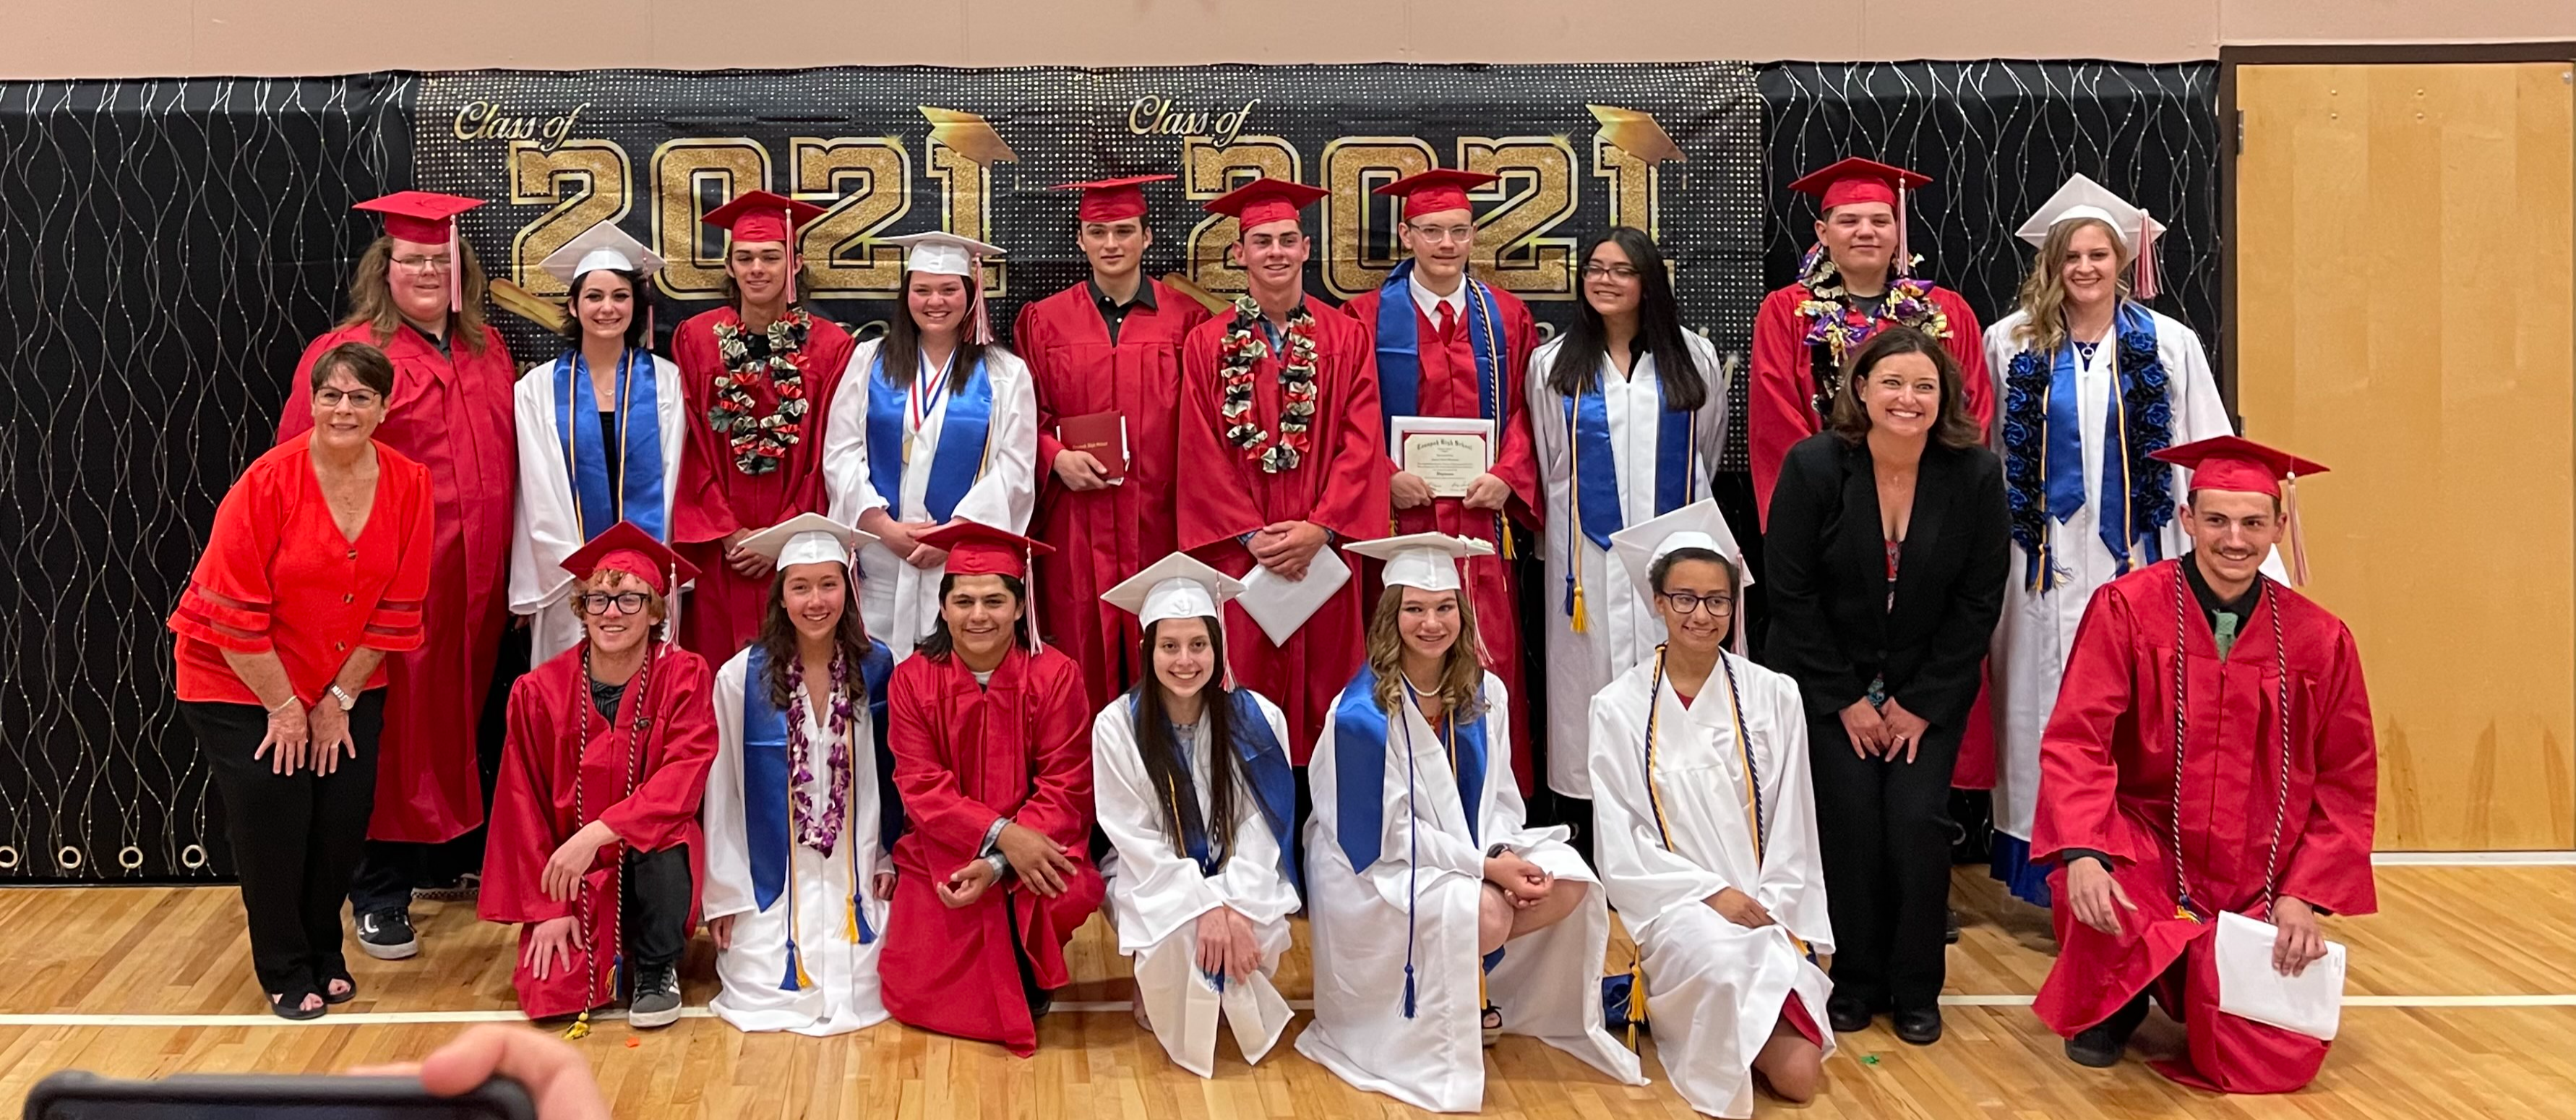 Tonopah High School Class of 2021